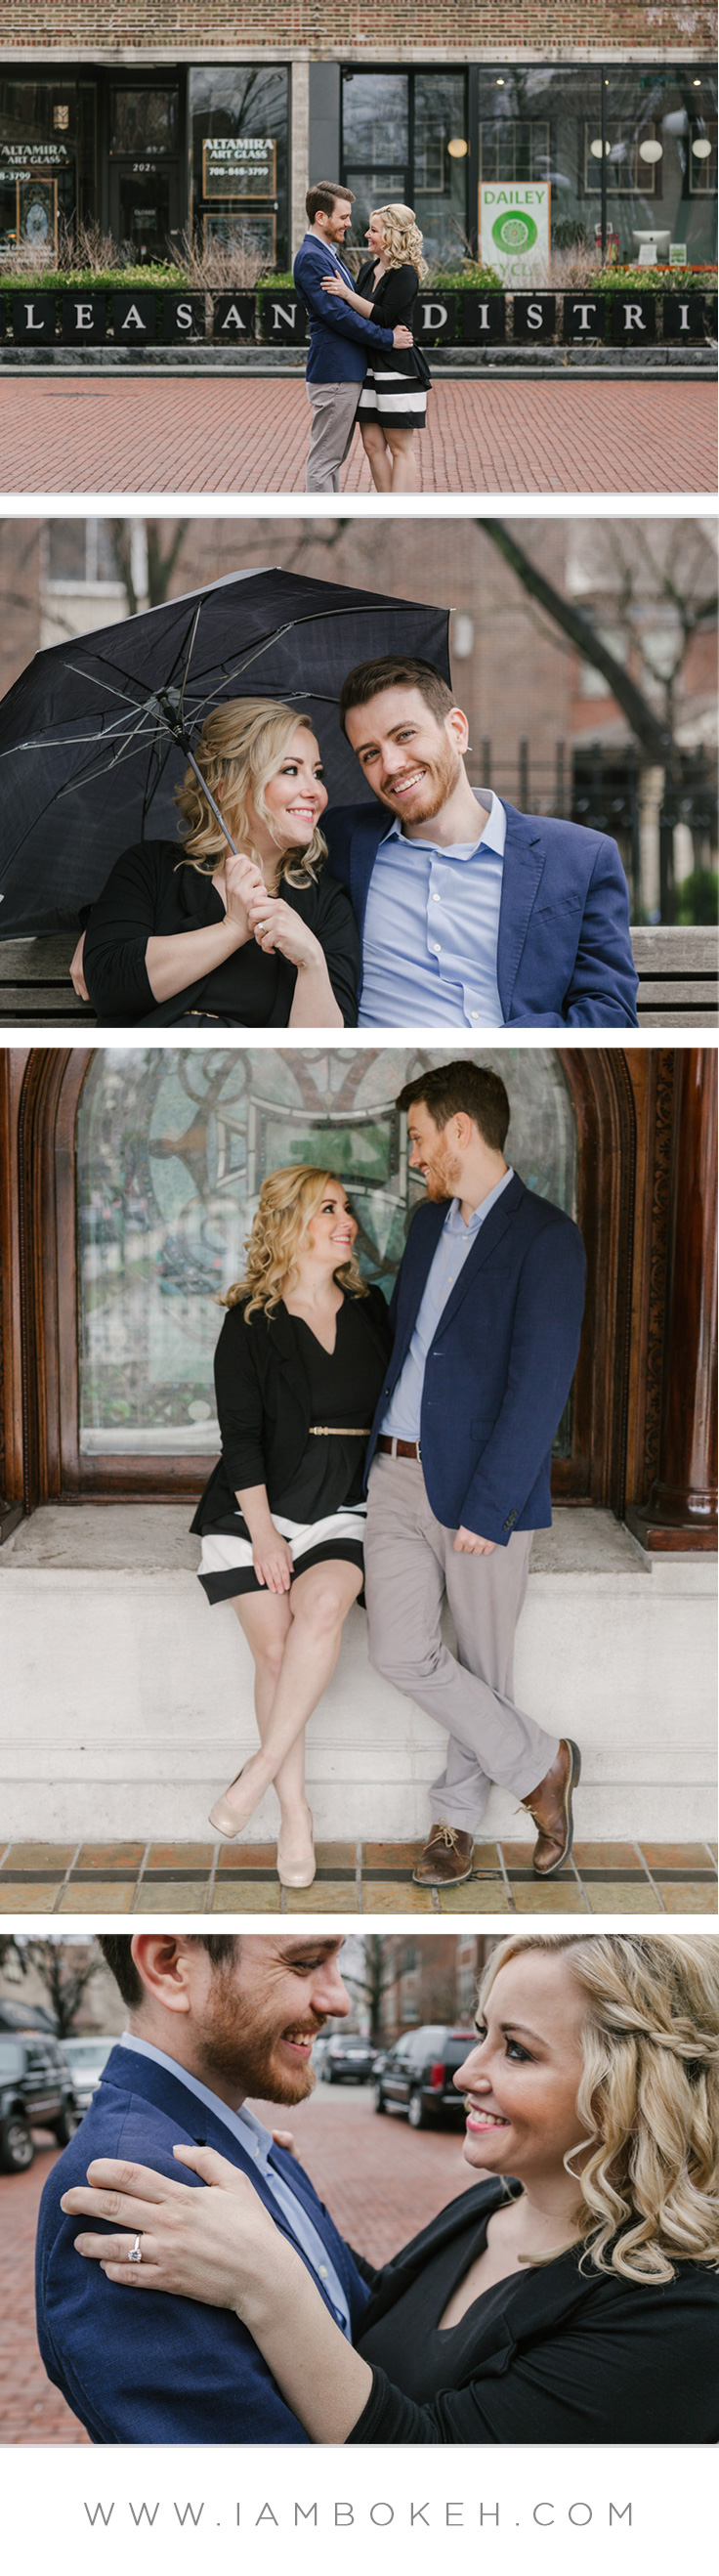 Engagement Shoot in Downtown Oak Park: Craig & Sarah